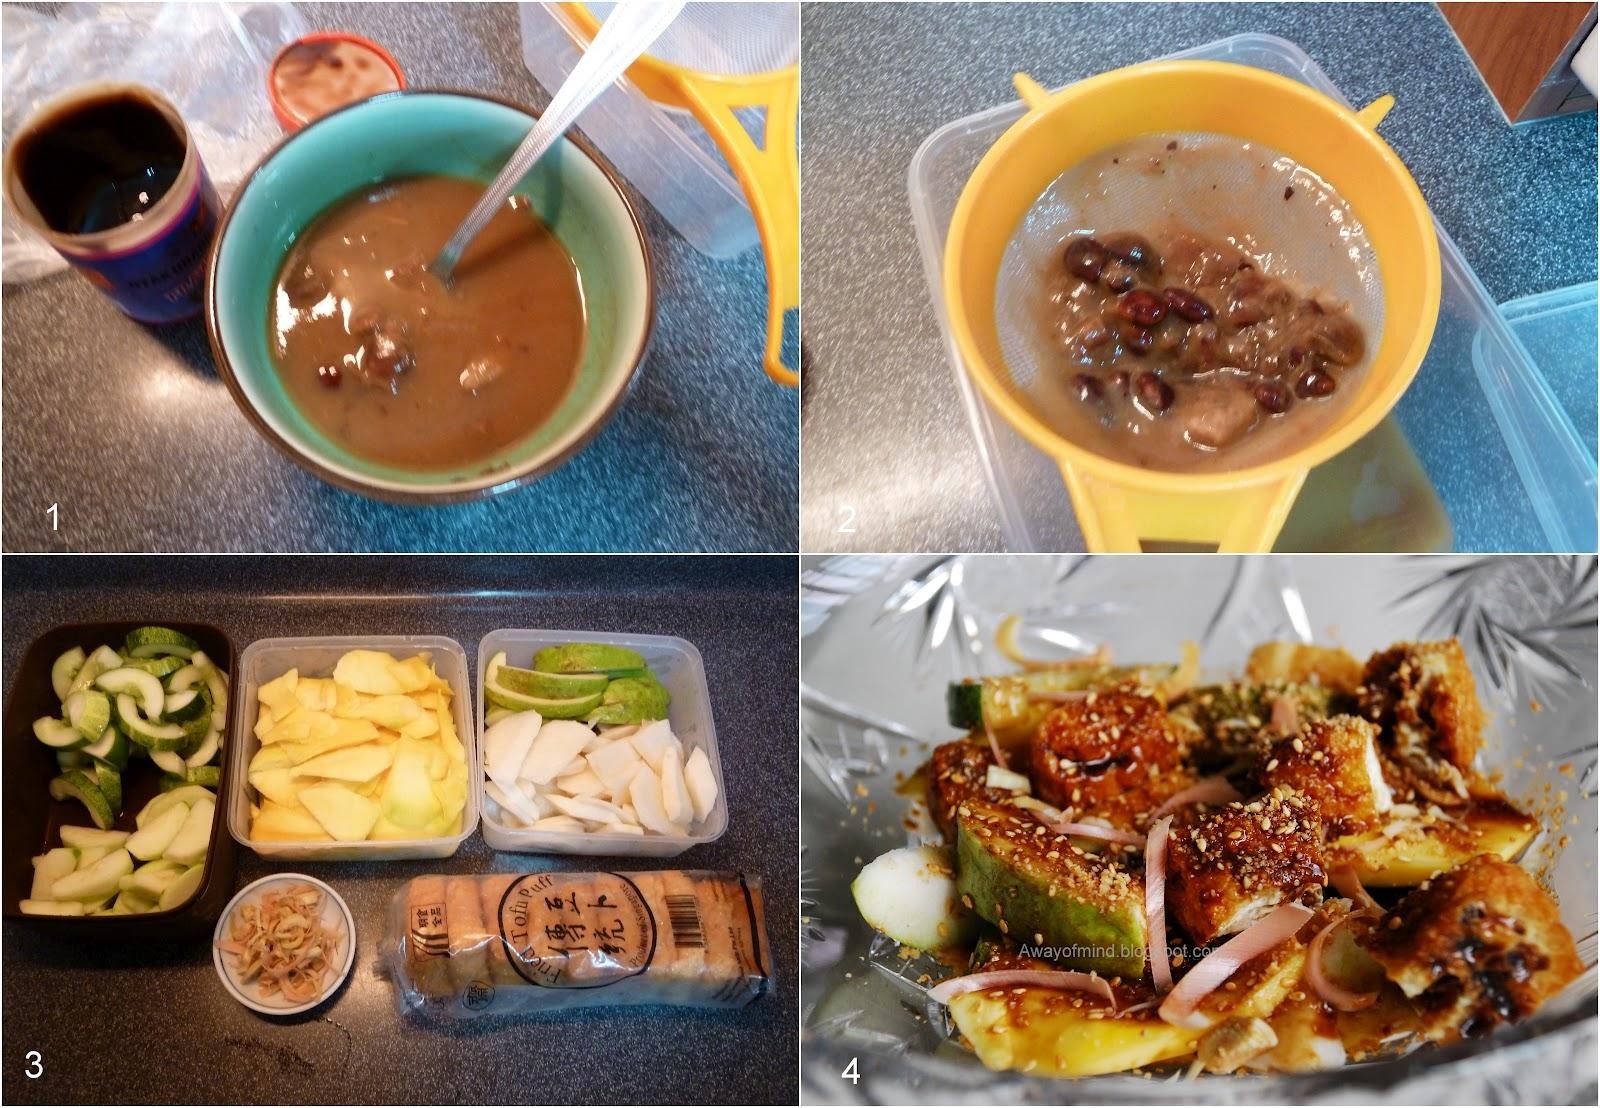 Awayofmind Bakery House: Homemade Penang Rojak